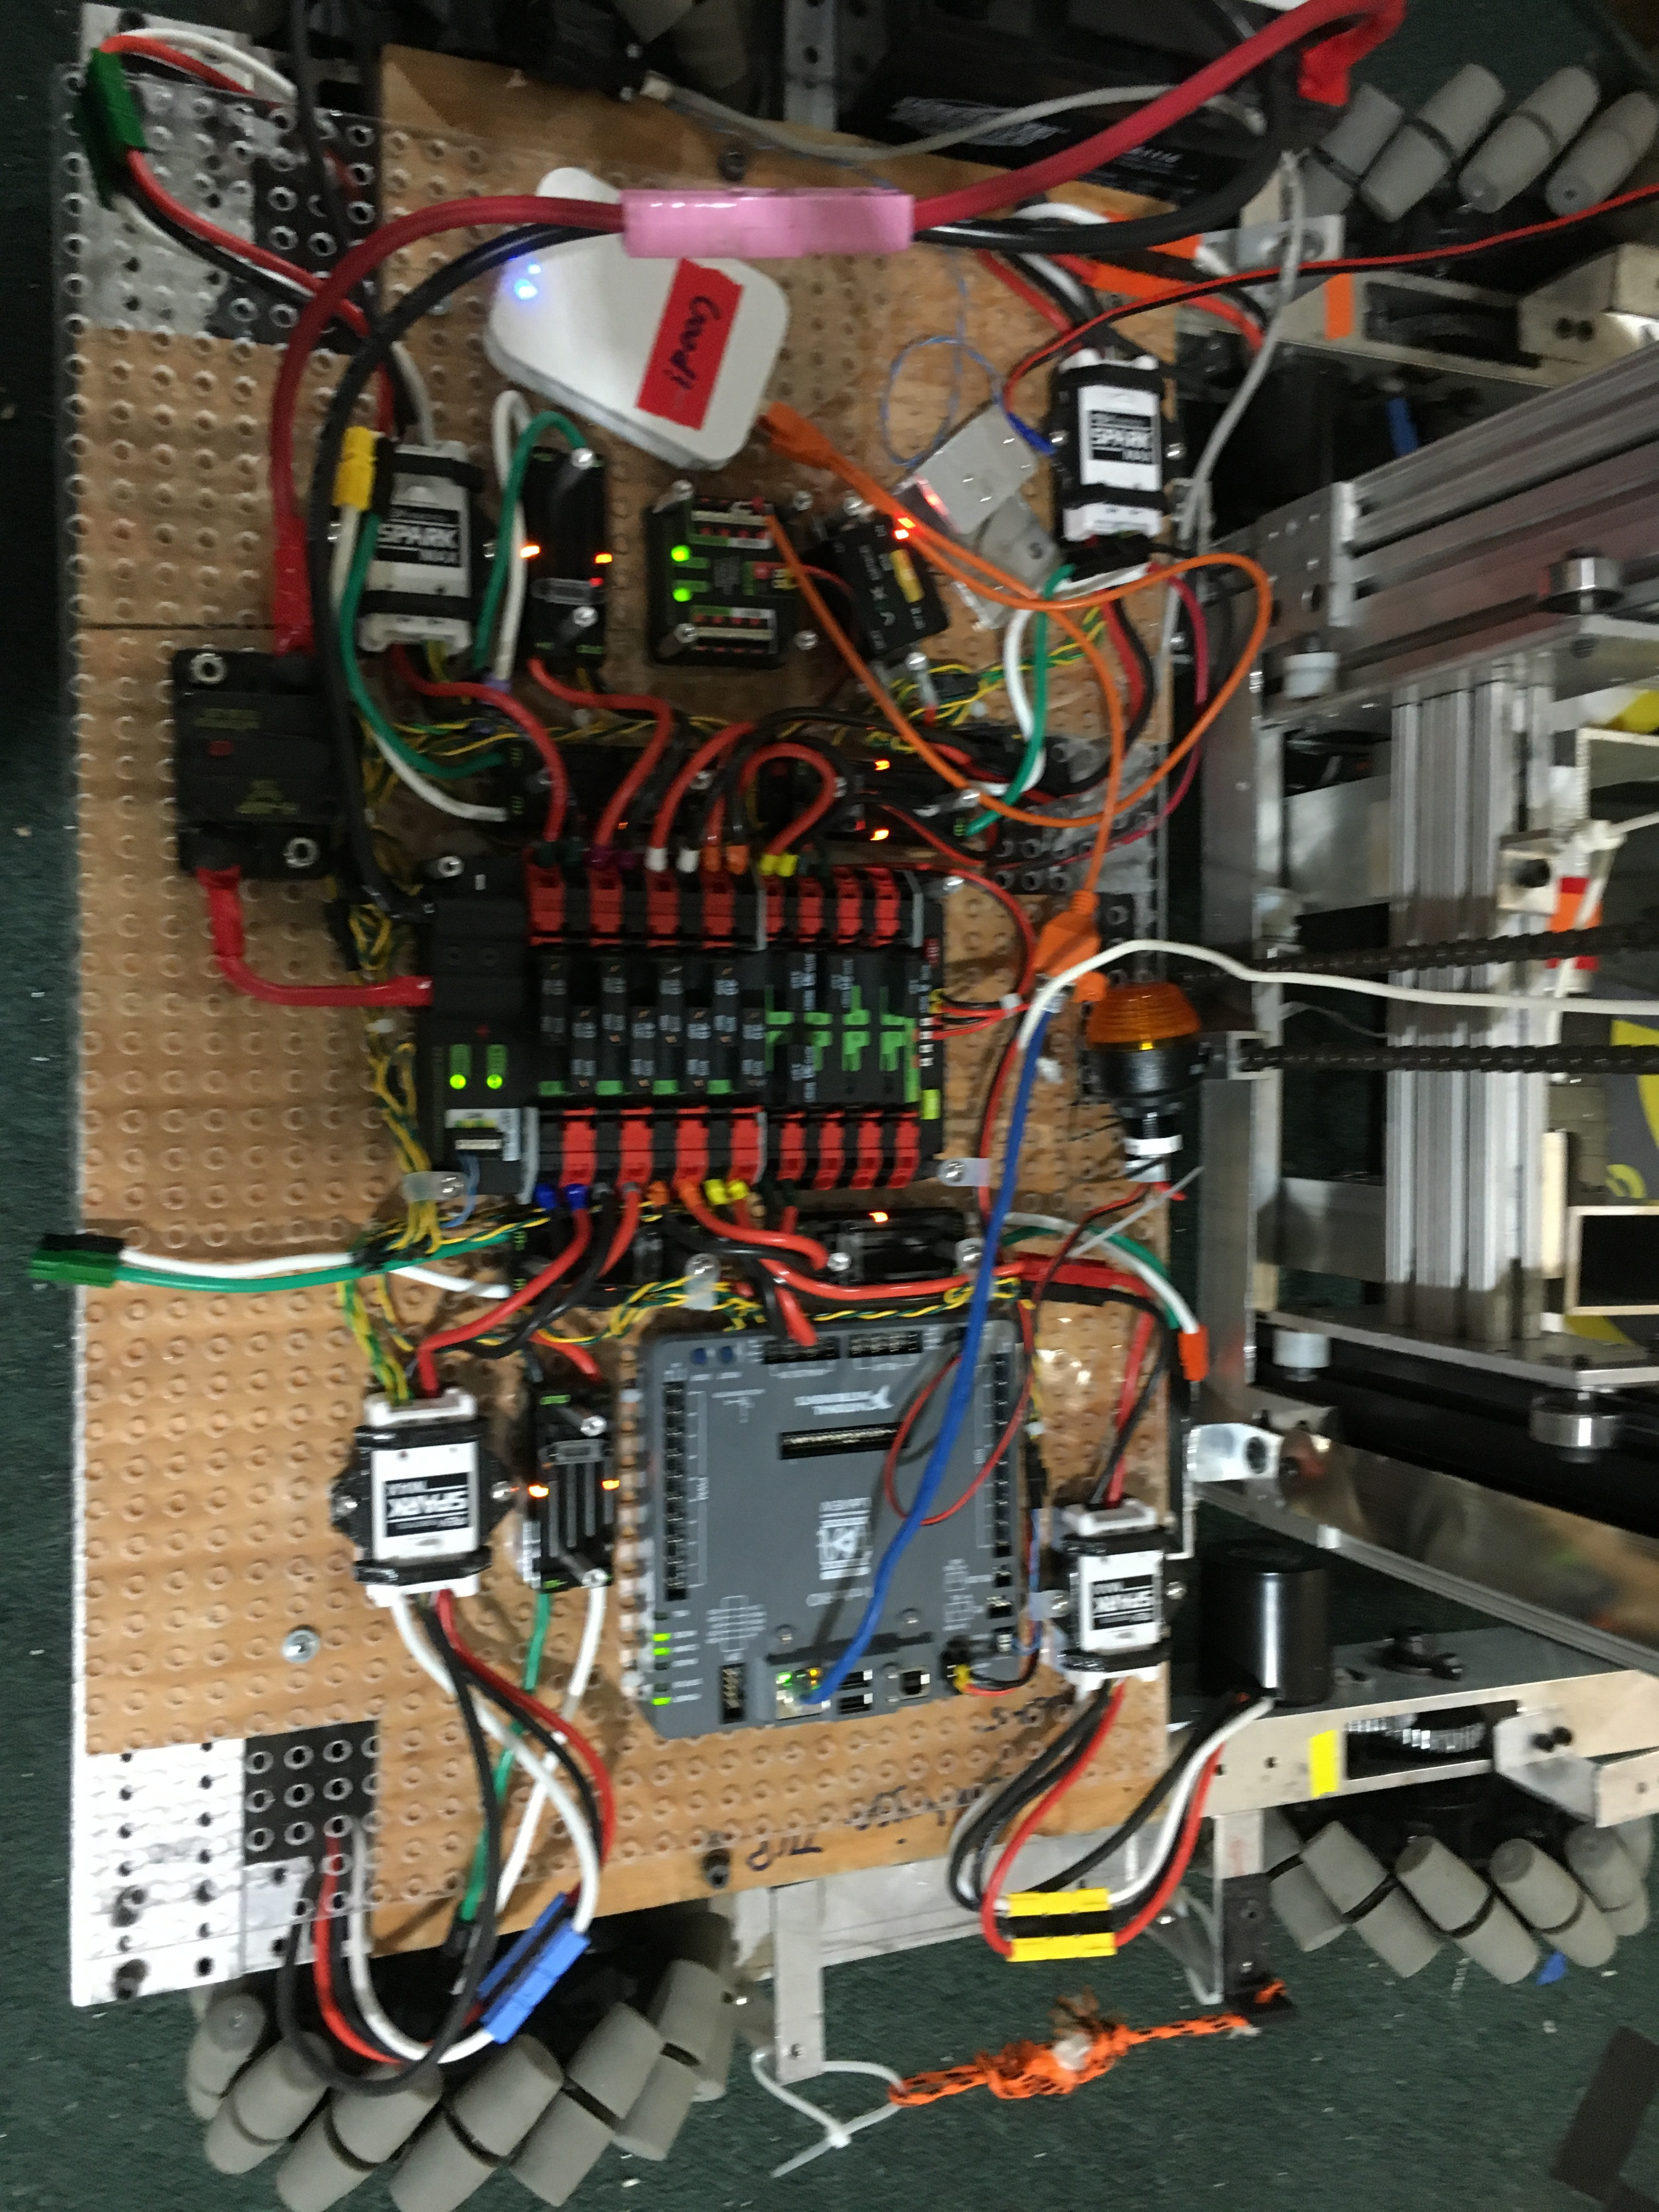 Spark Max motor controller randomly failing - Technical - Chief Delphi